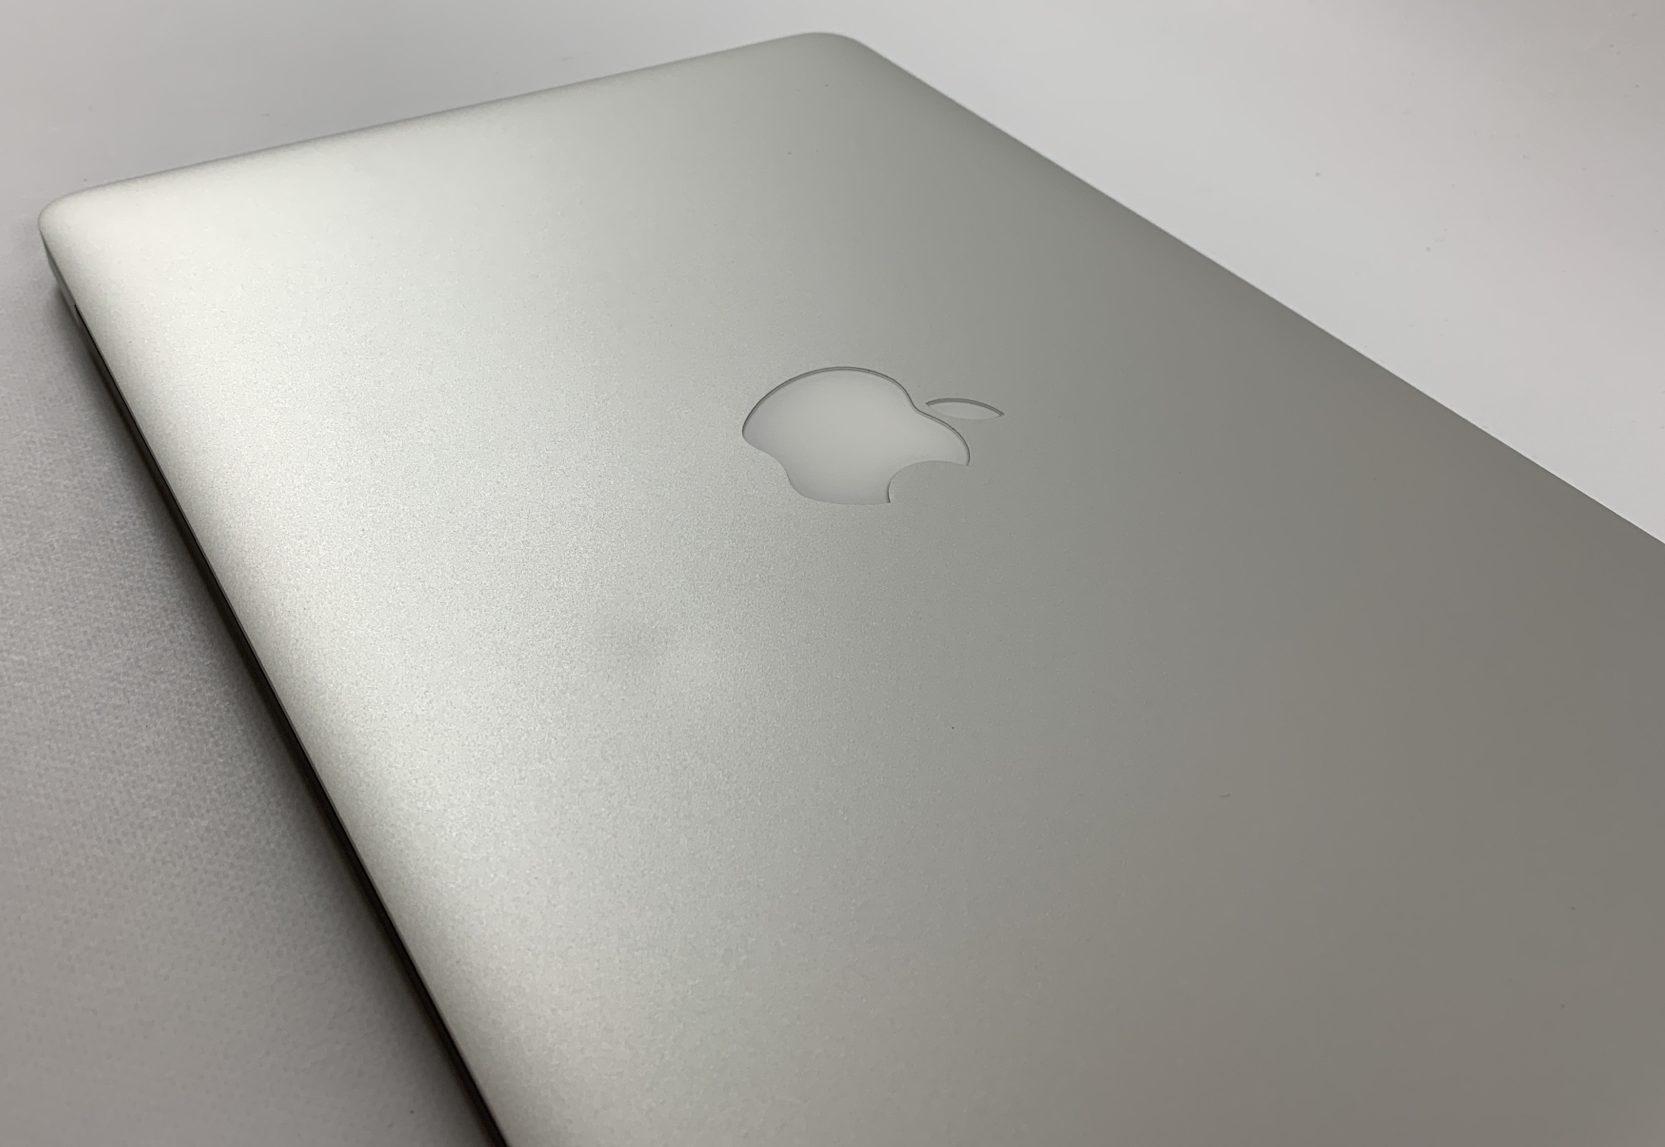 "MacBook Pro Retina 13"" Early 2015 (Intel Core i5 2.7 GHz 8 GB RAM 128 GB SSD), Intel Core i5 2.7 GHz, 8 GB RAM, 128 GB SSD, image 4"